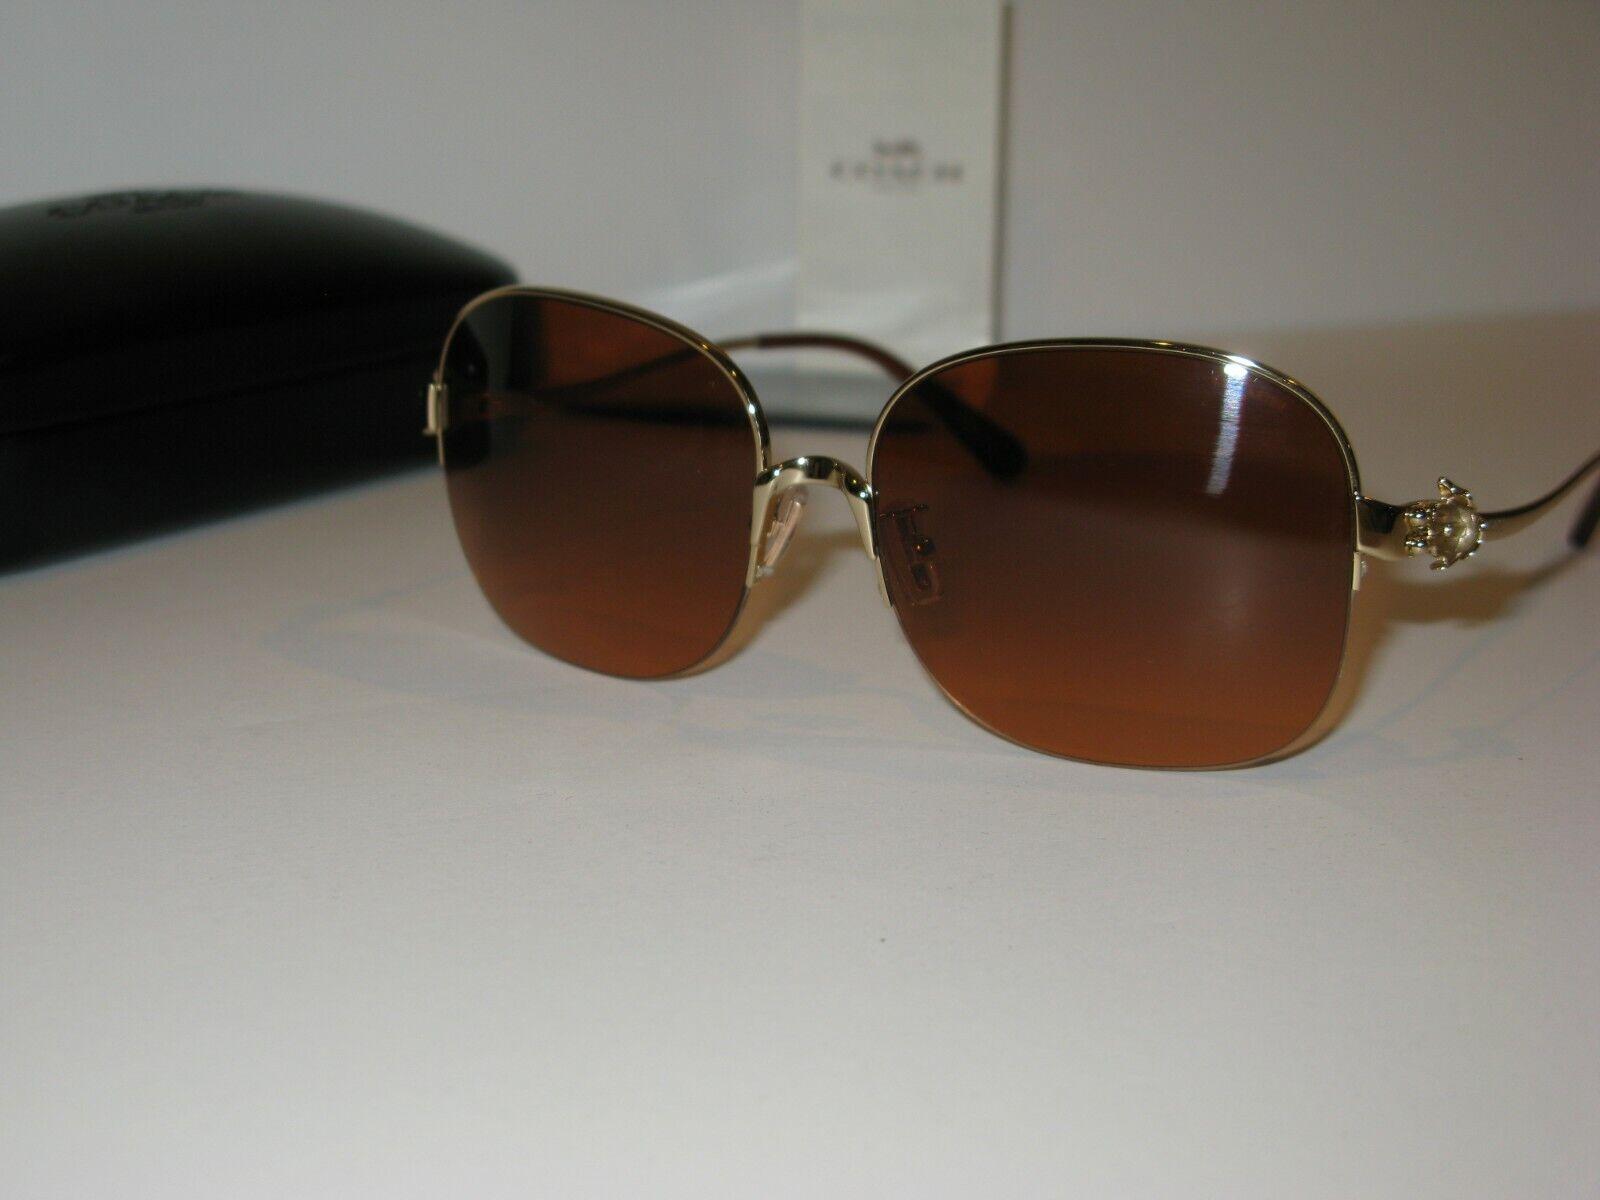 Coach Women's Light Gold / Milk Amber Sunglasses with Case. HC7068 (L1609).